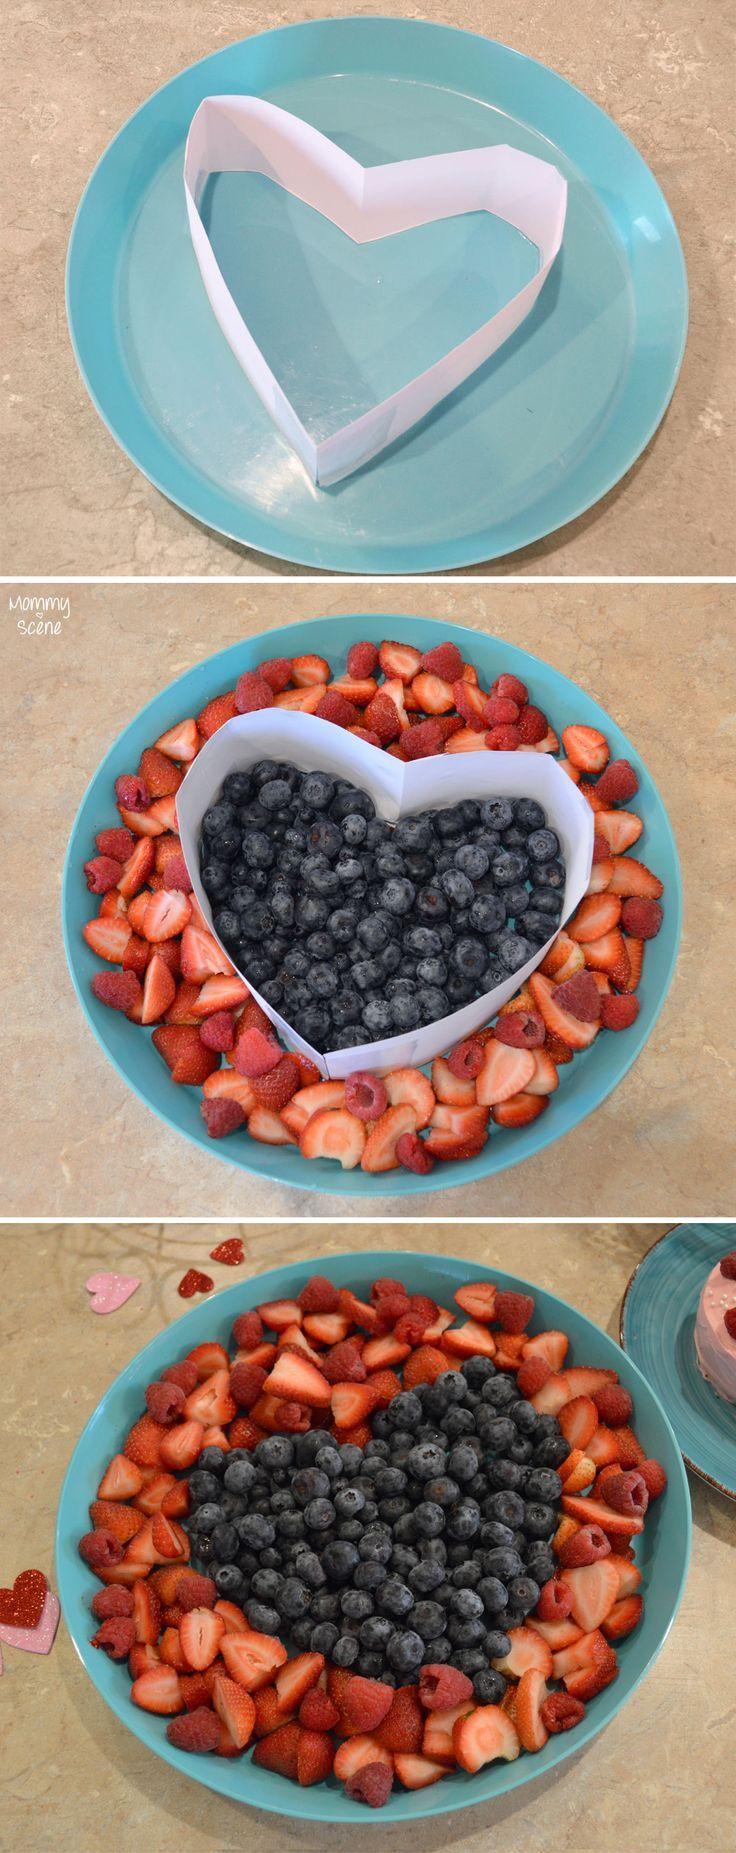 The 25 Best Fruit Platter Designs Ideas On Pinterest